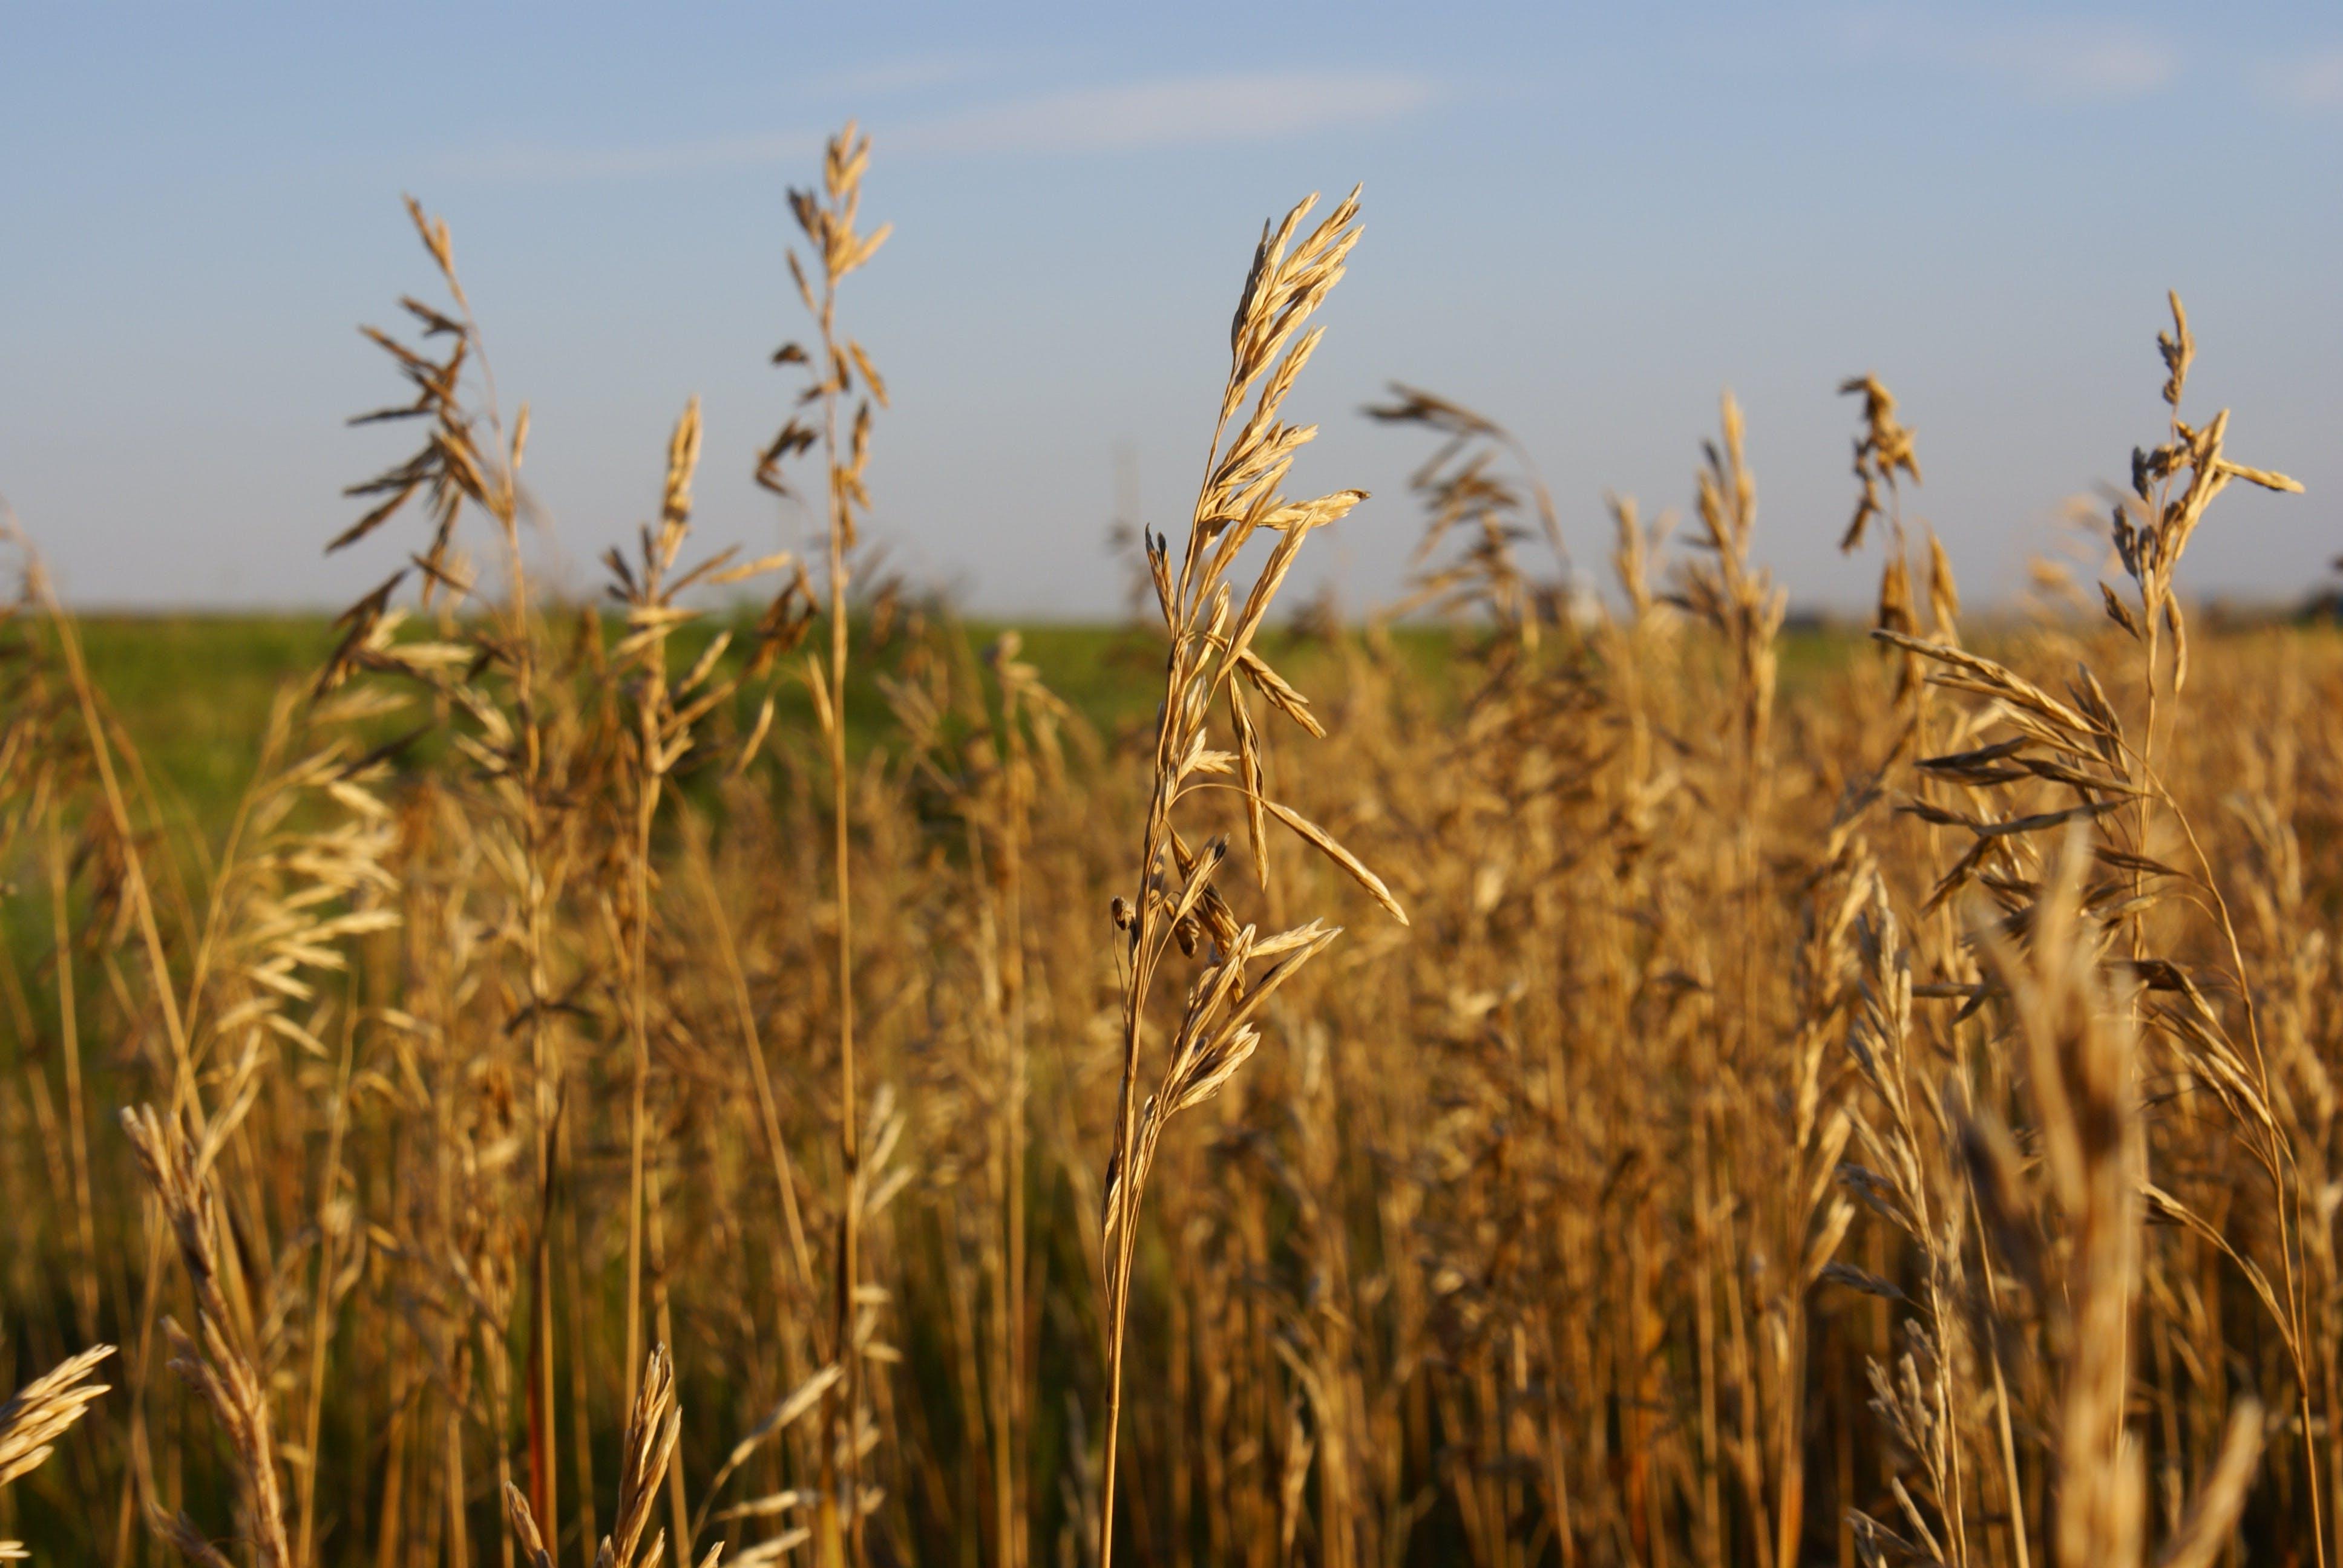 Kostenloses Stock Foto zu grasland, weizengrass